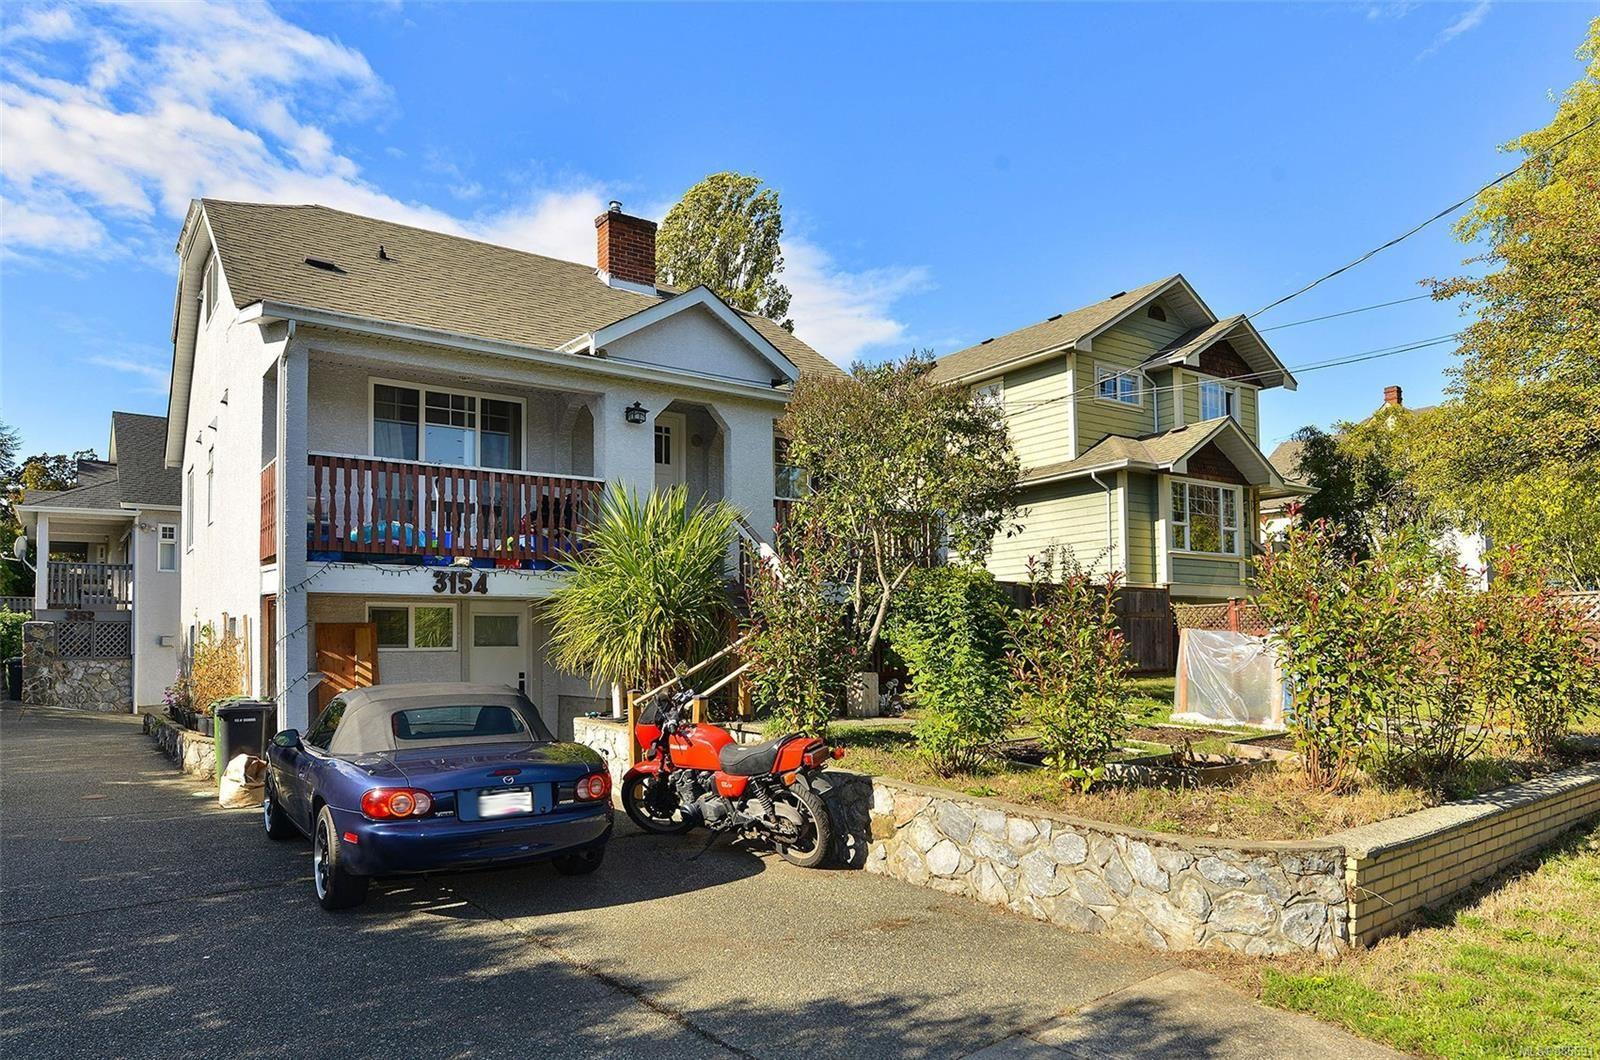 Main Photo: 3154 CARROLL St in : Vi Burnside Half Duplex for sale (Victoria)  : MLS®# 886691